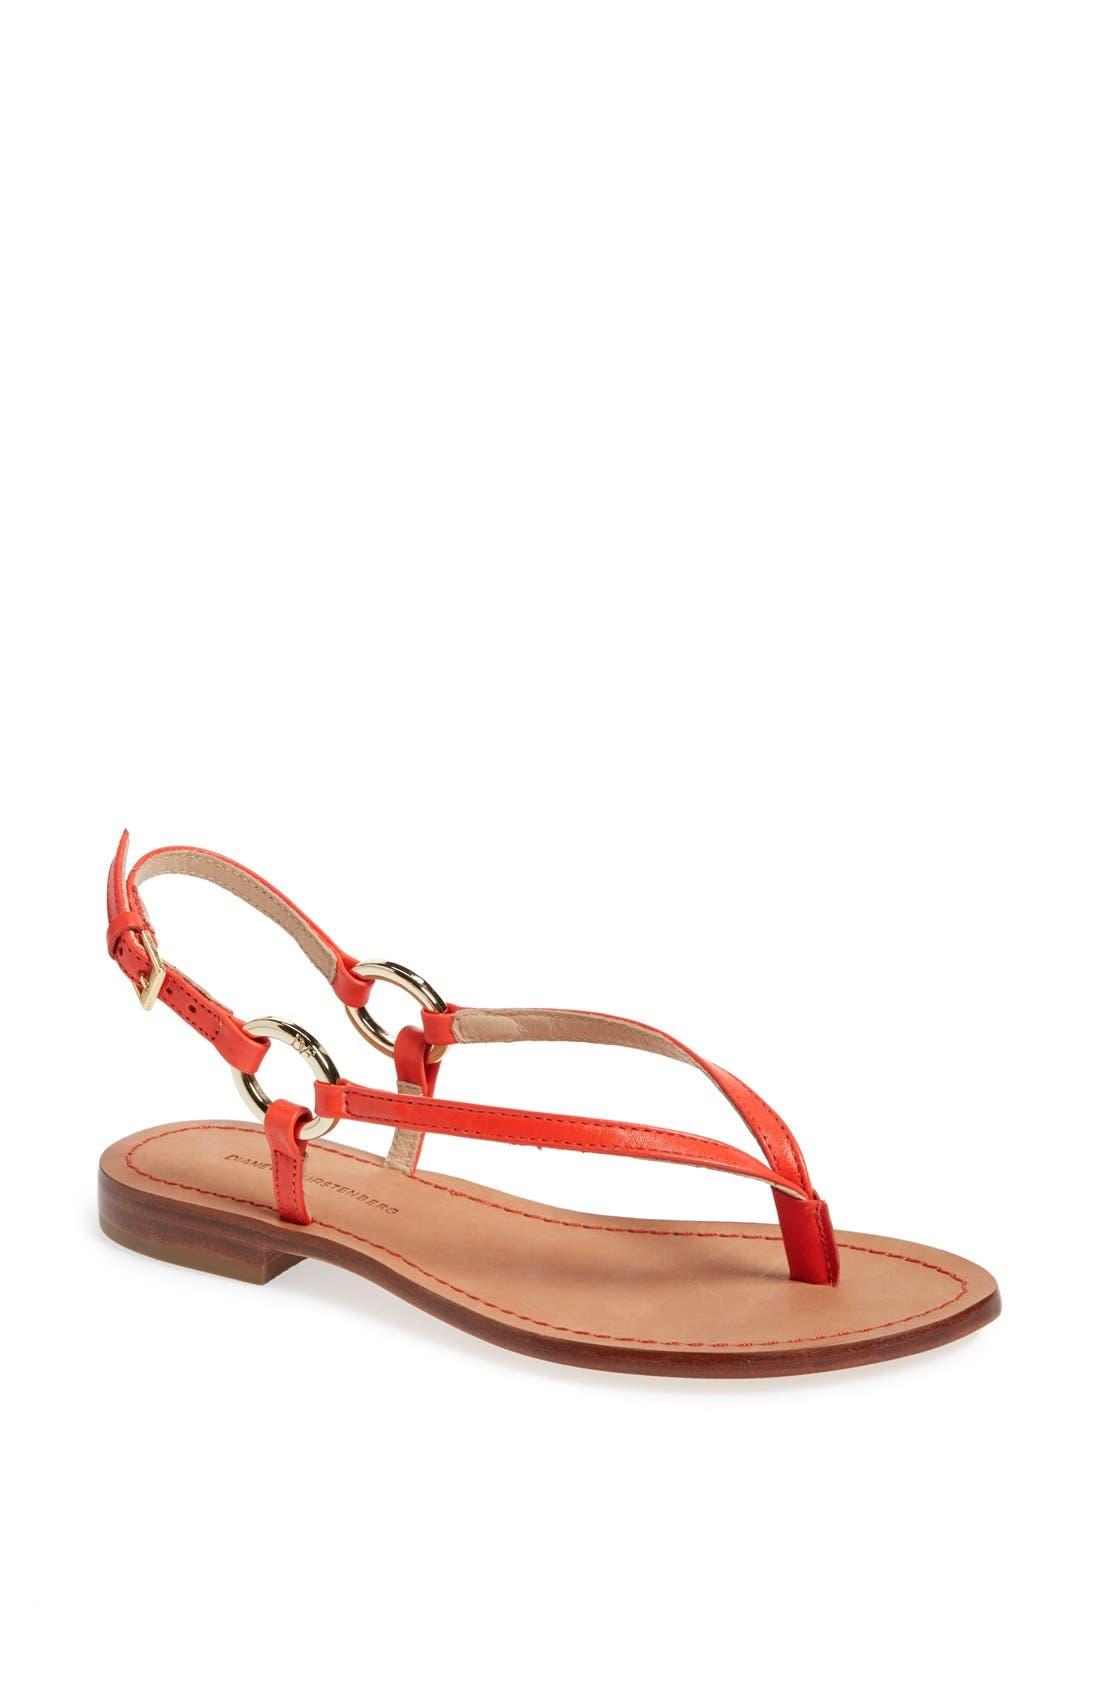 Alternate Image 1 Selected - Diane von Furstenberg 'Cailin' Thong Sandal